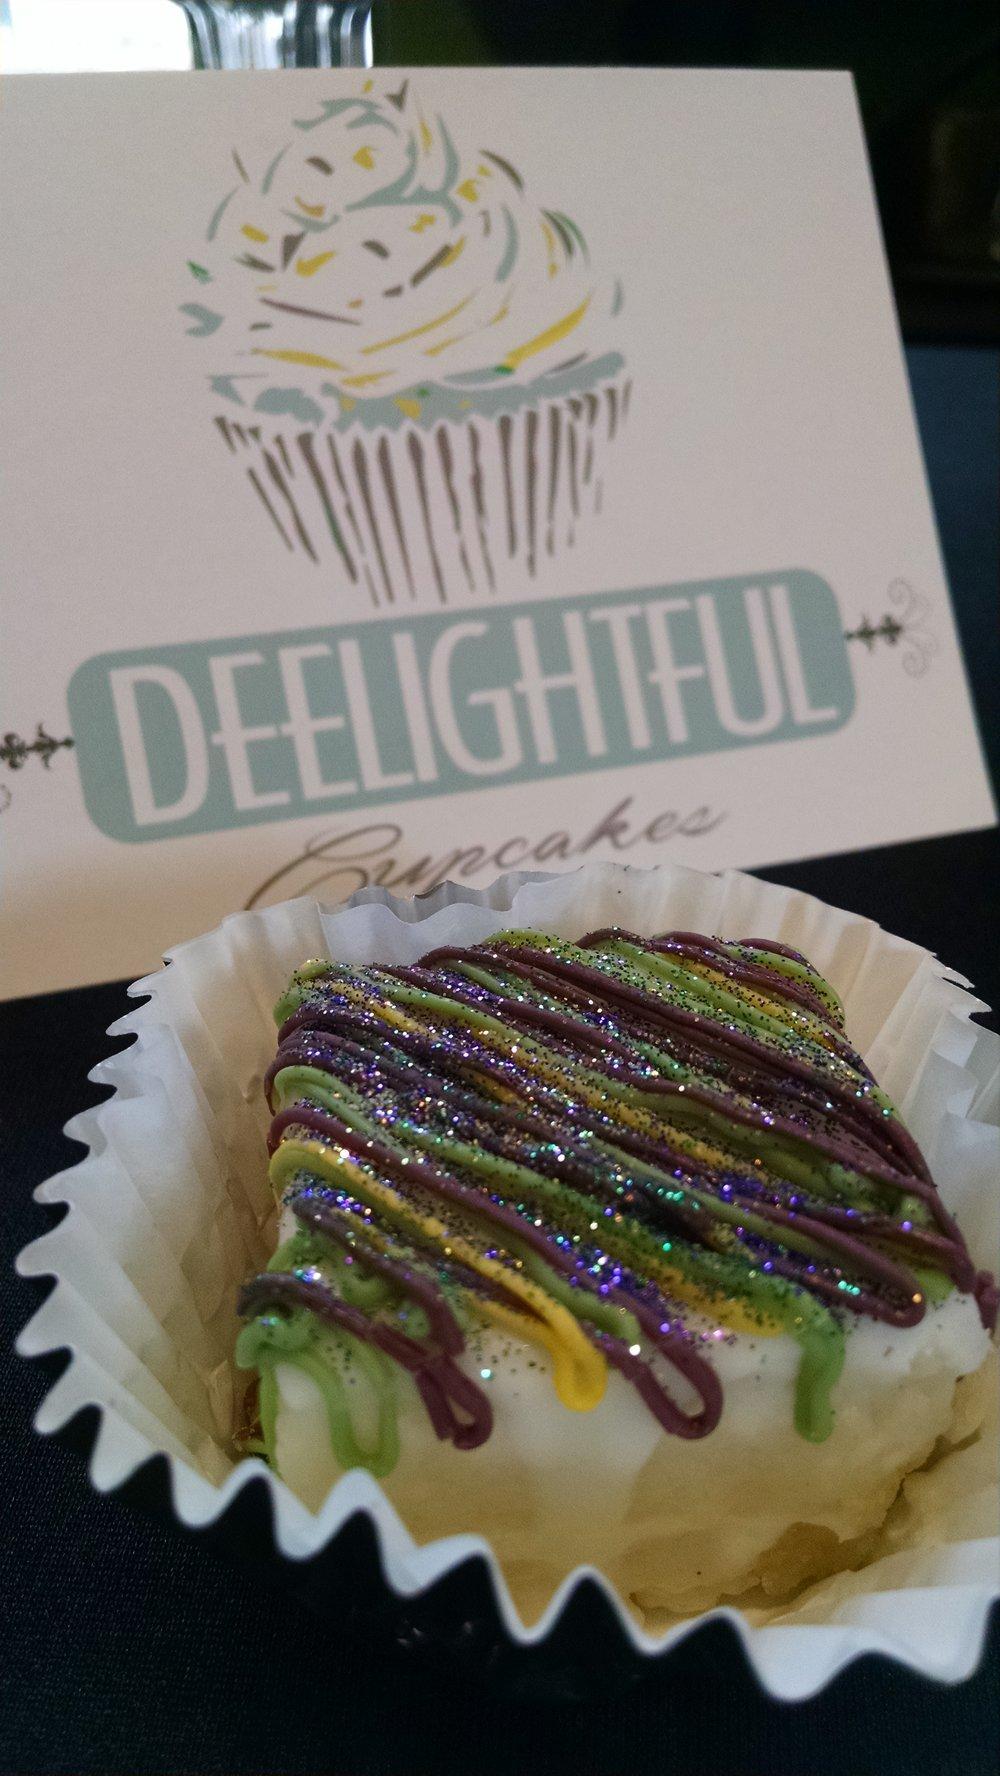 Deelightful Cupcakes 1st Place Bakery Carnival